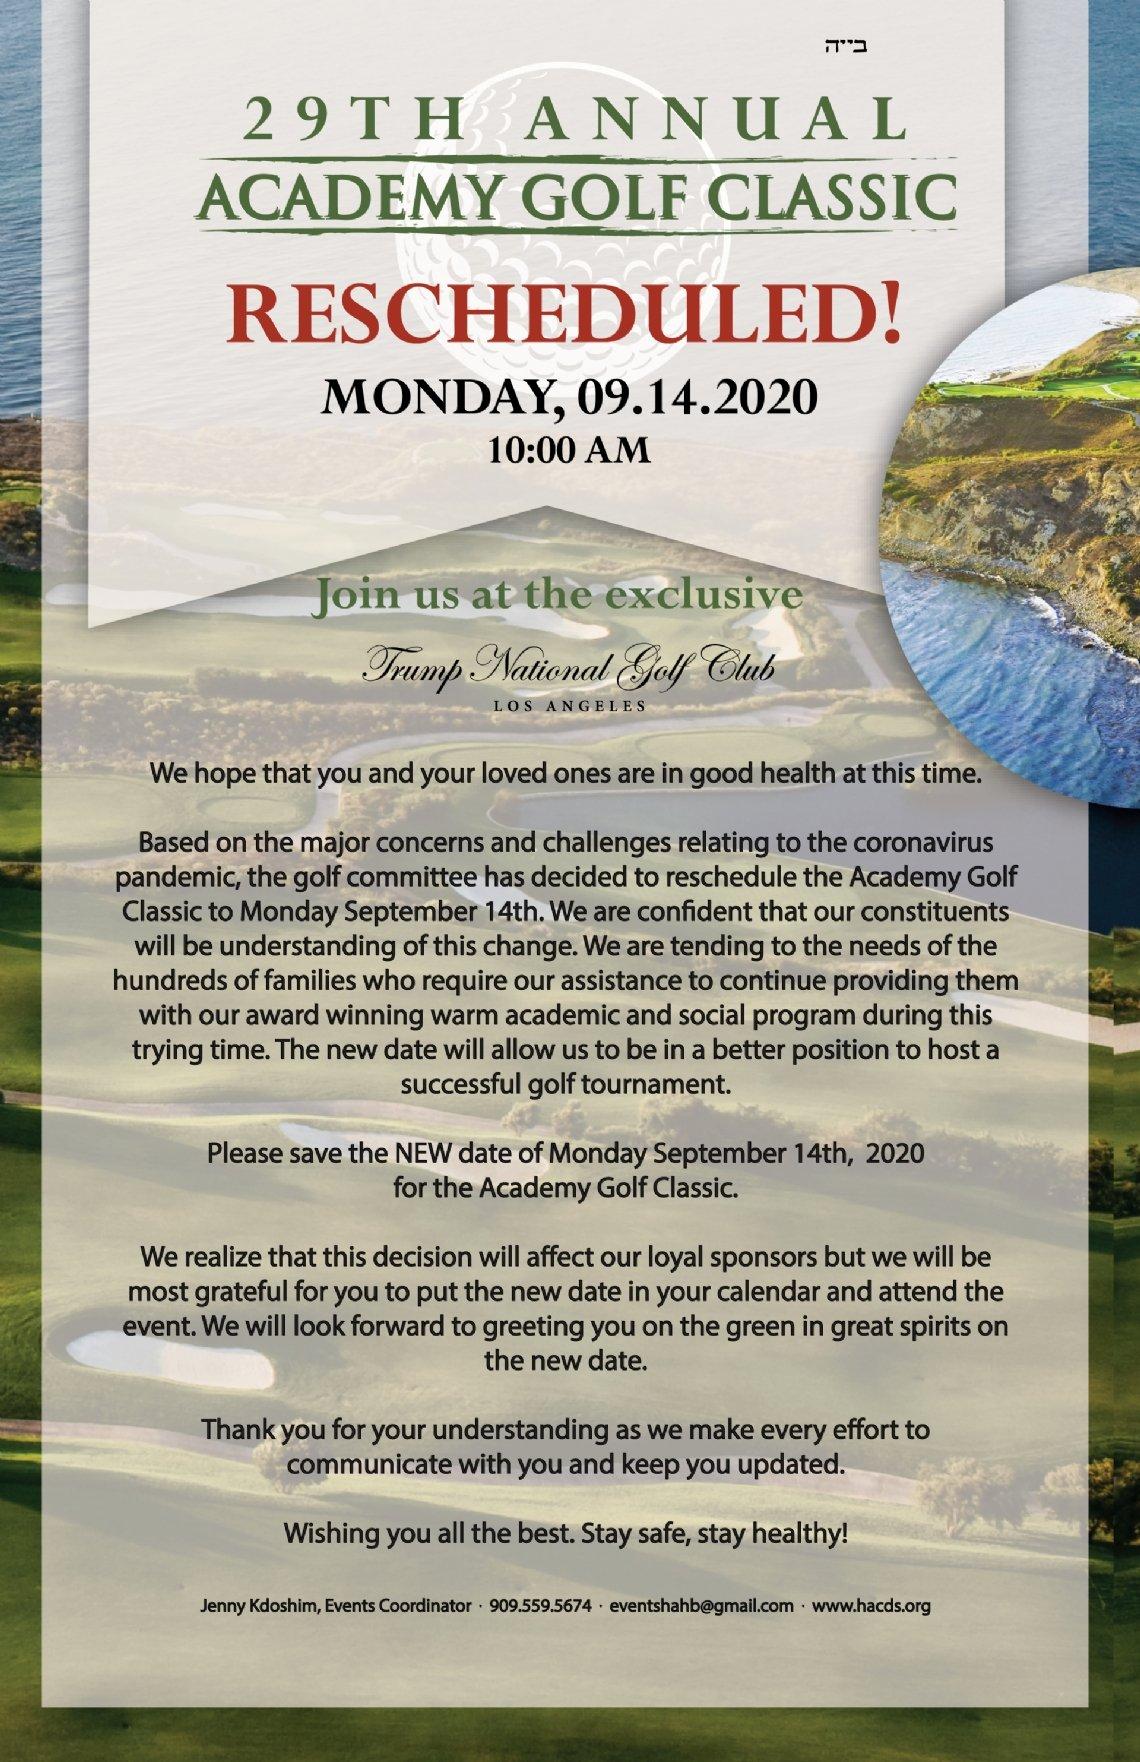 2020_GolfInvite_JK_Reschedule3.jpg